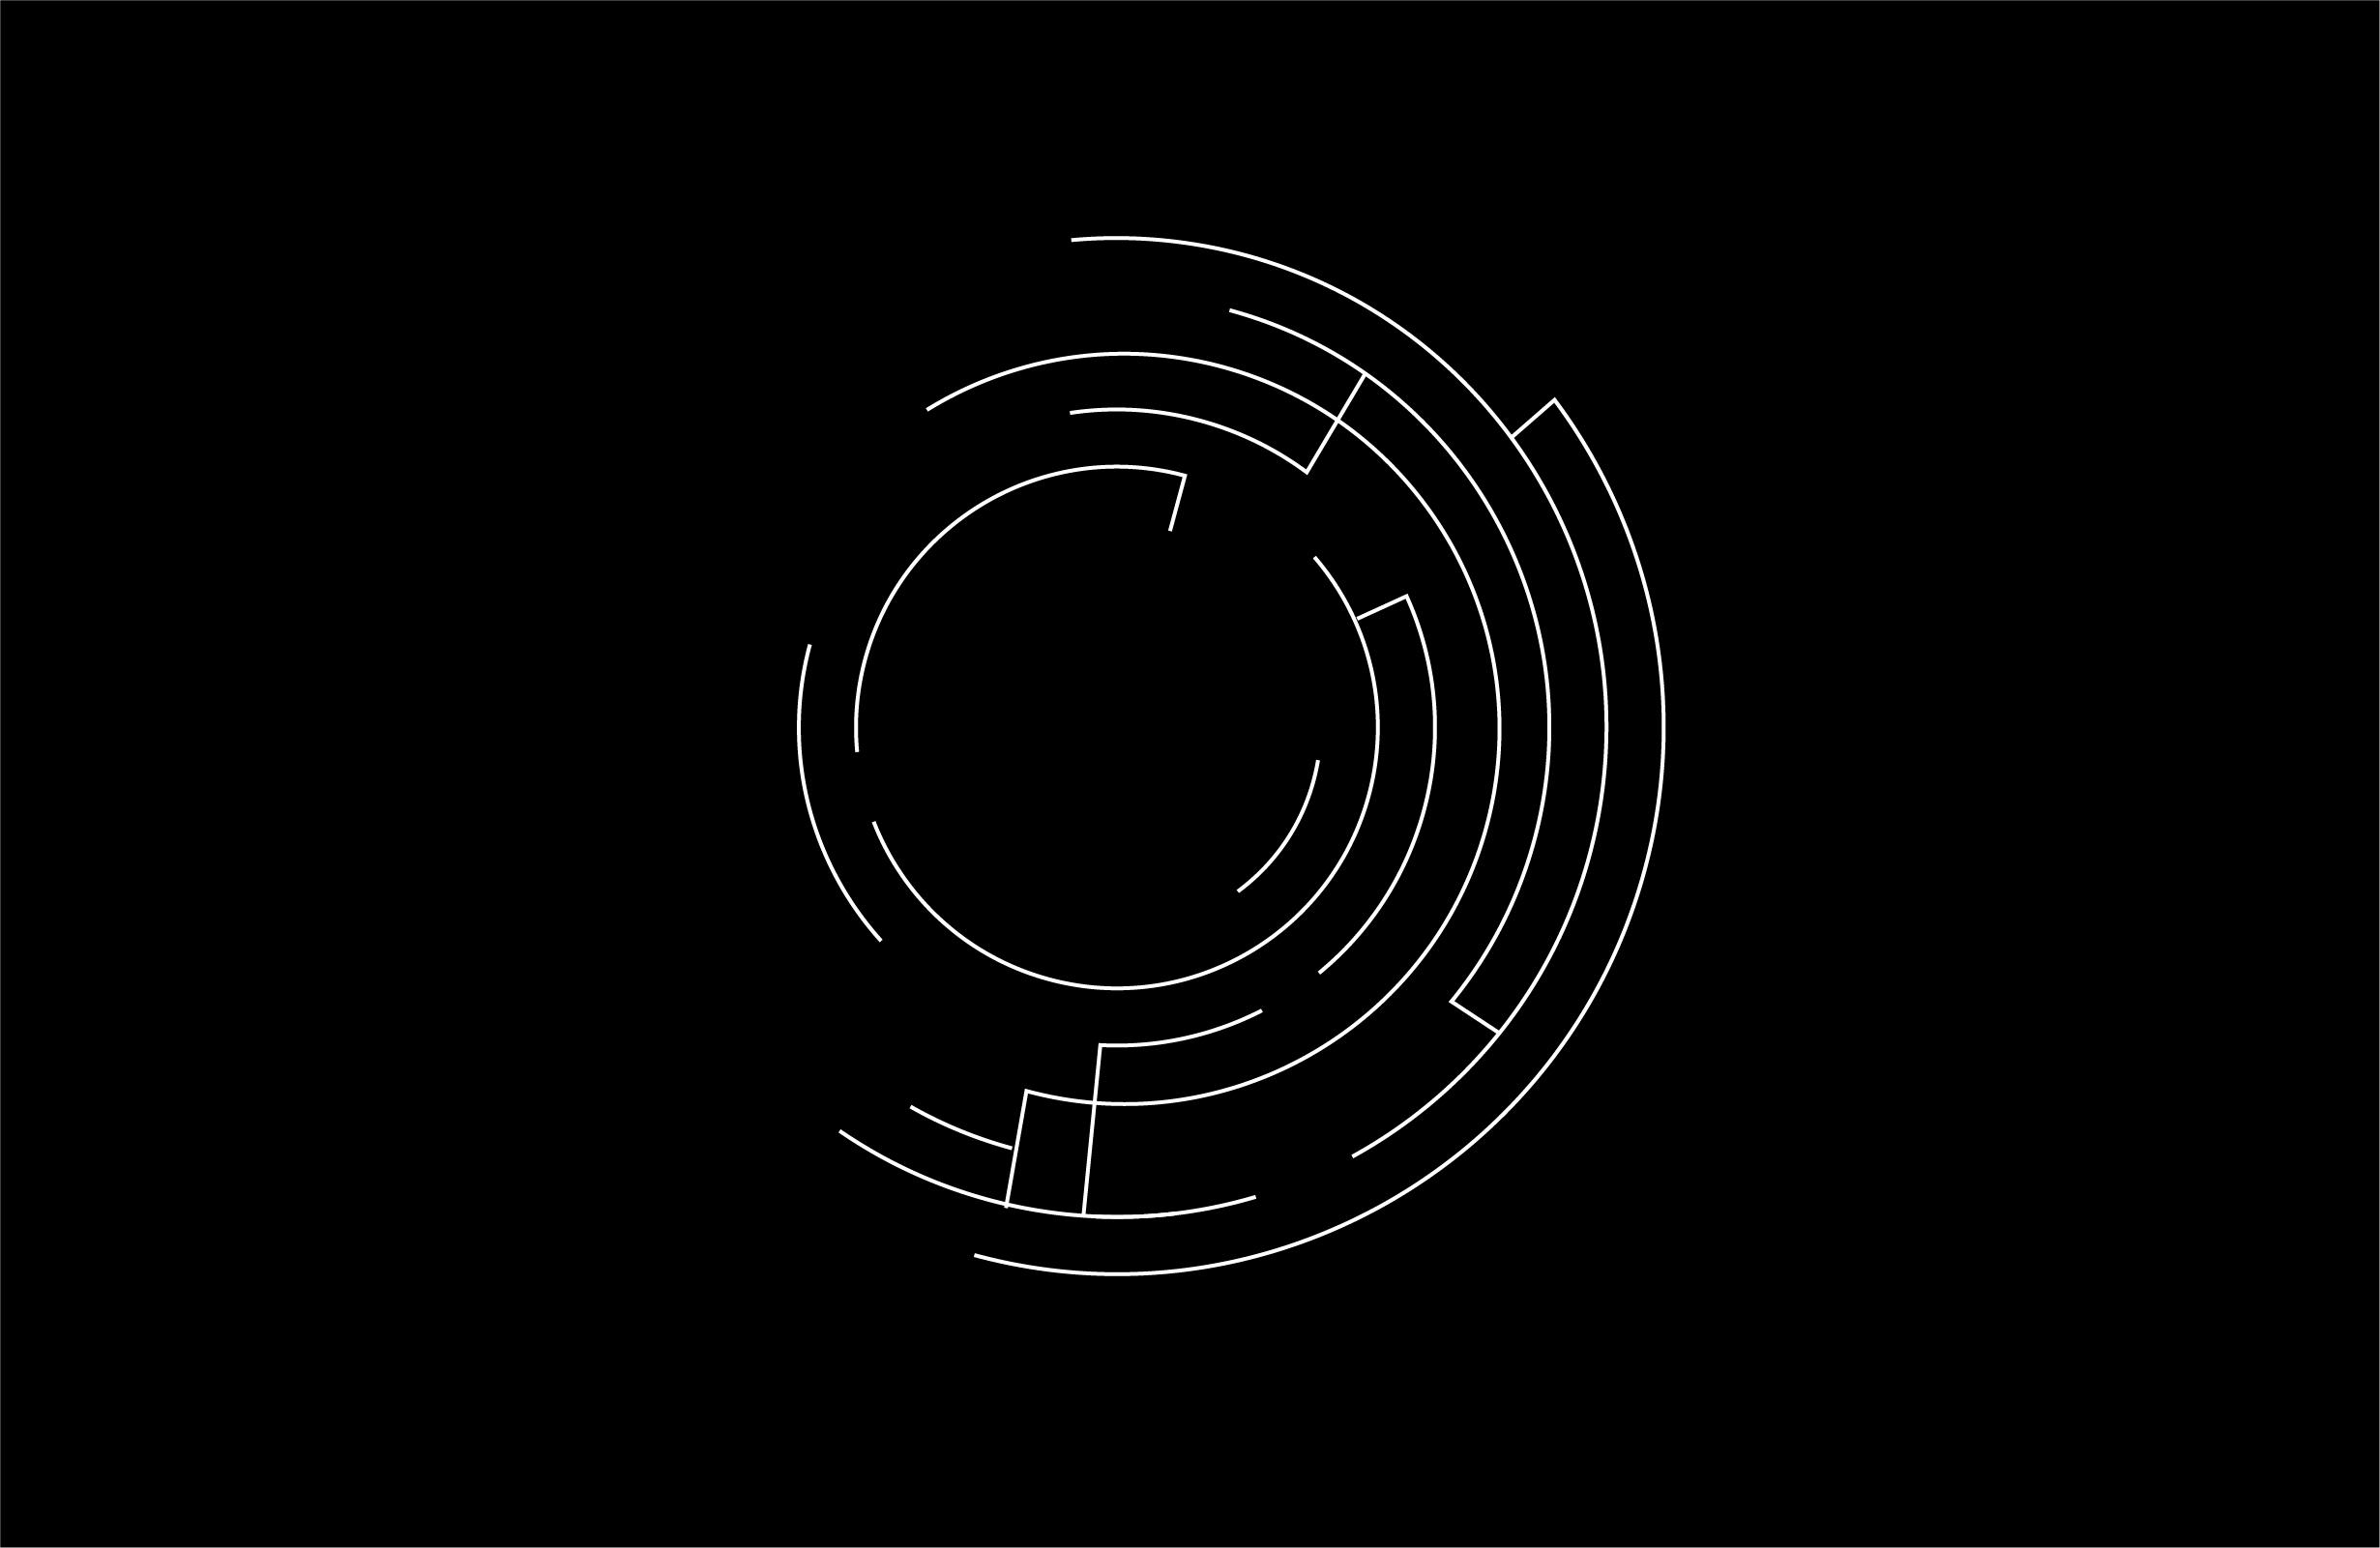 circle graph illustration